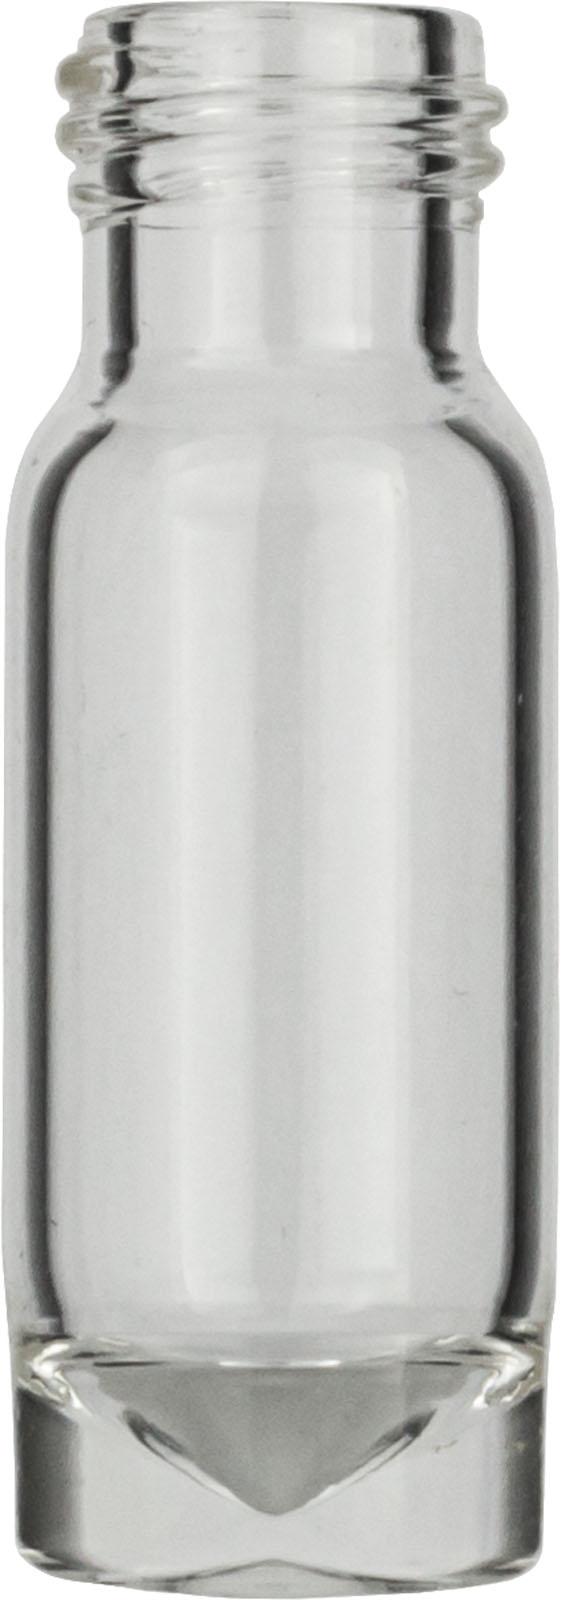 Vial N9-1.1, GW, k, 11,6x32, Innenkonus